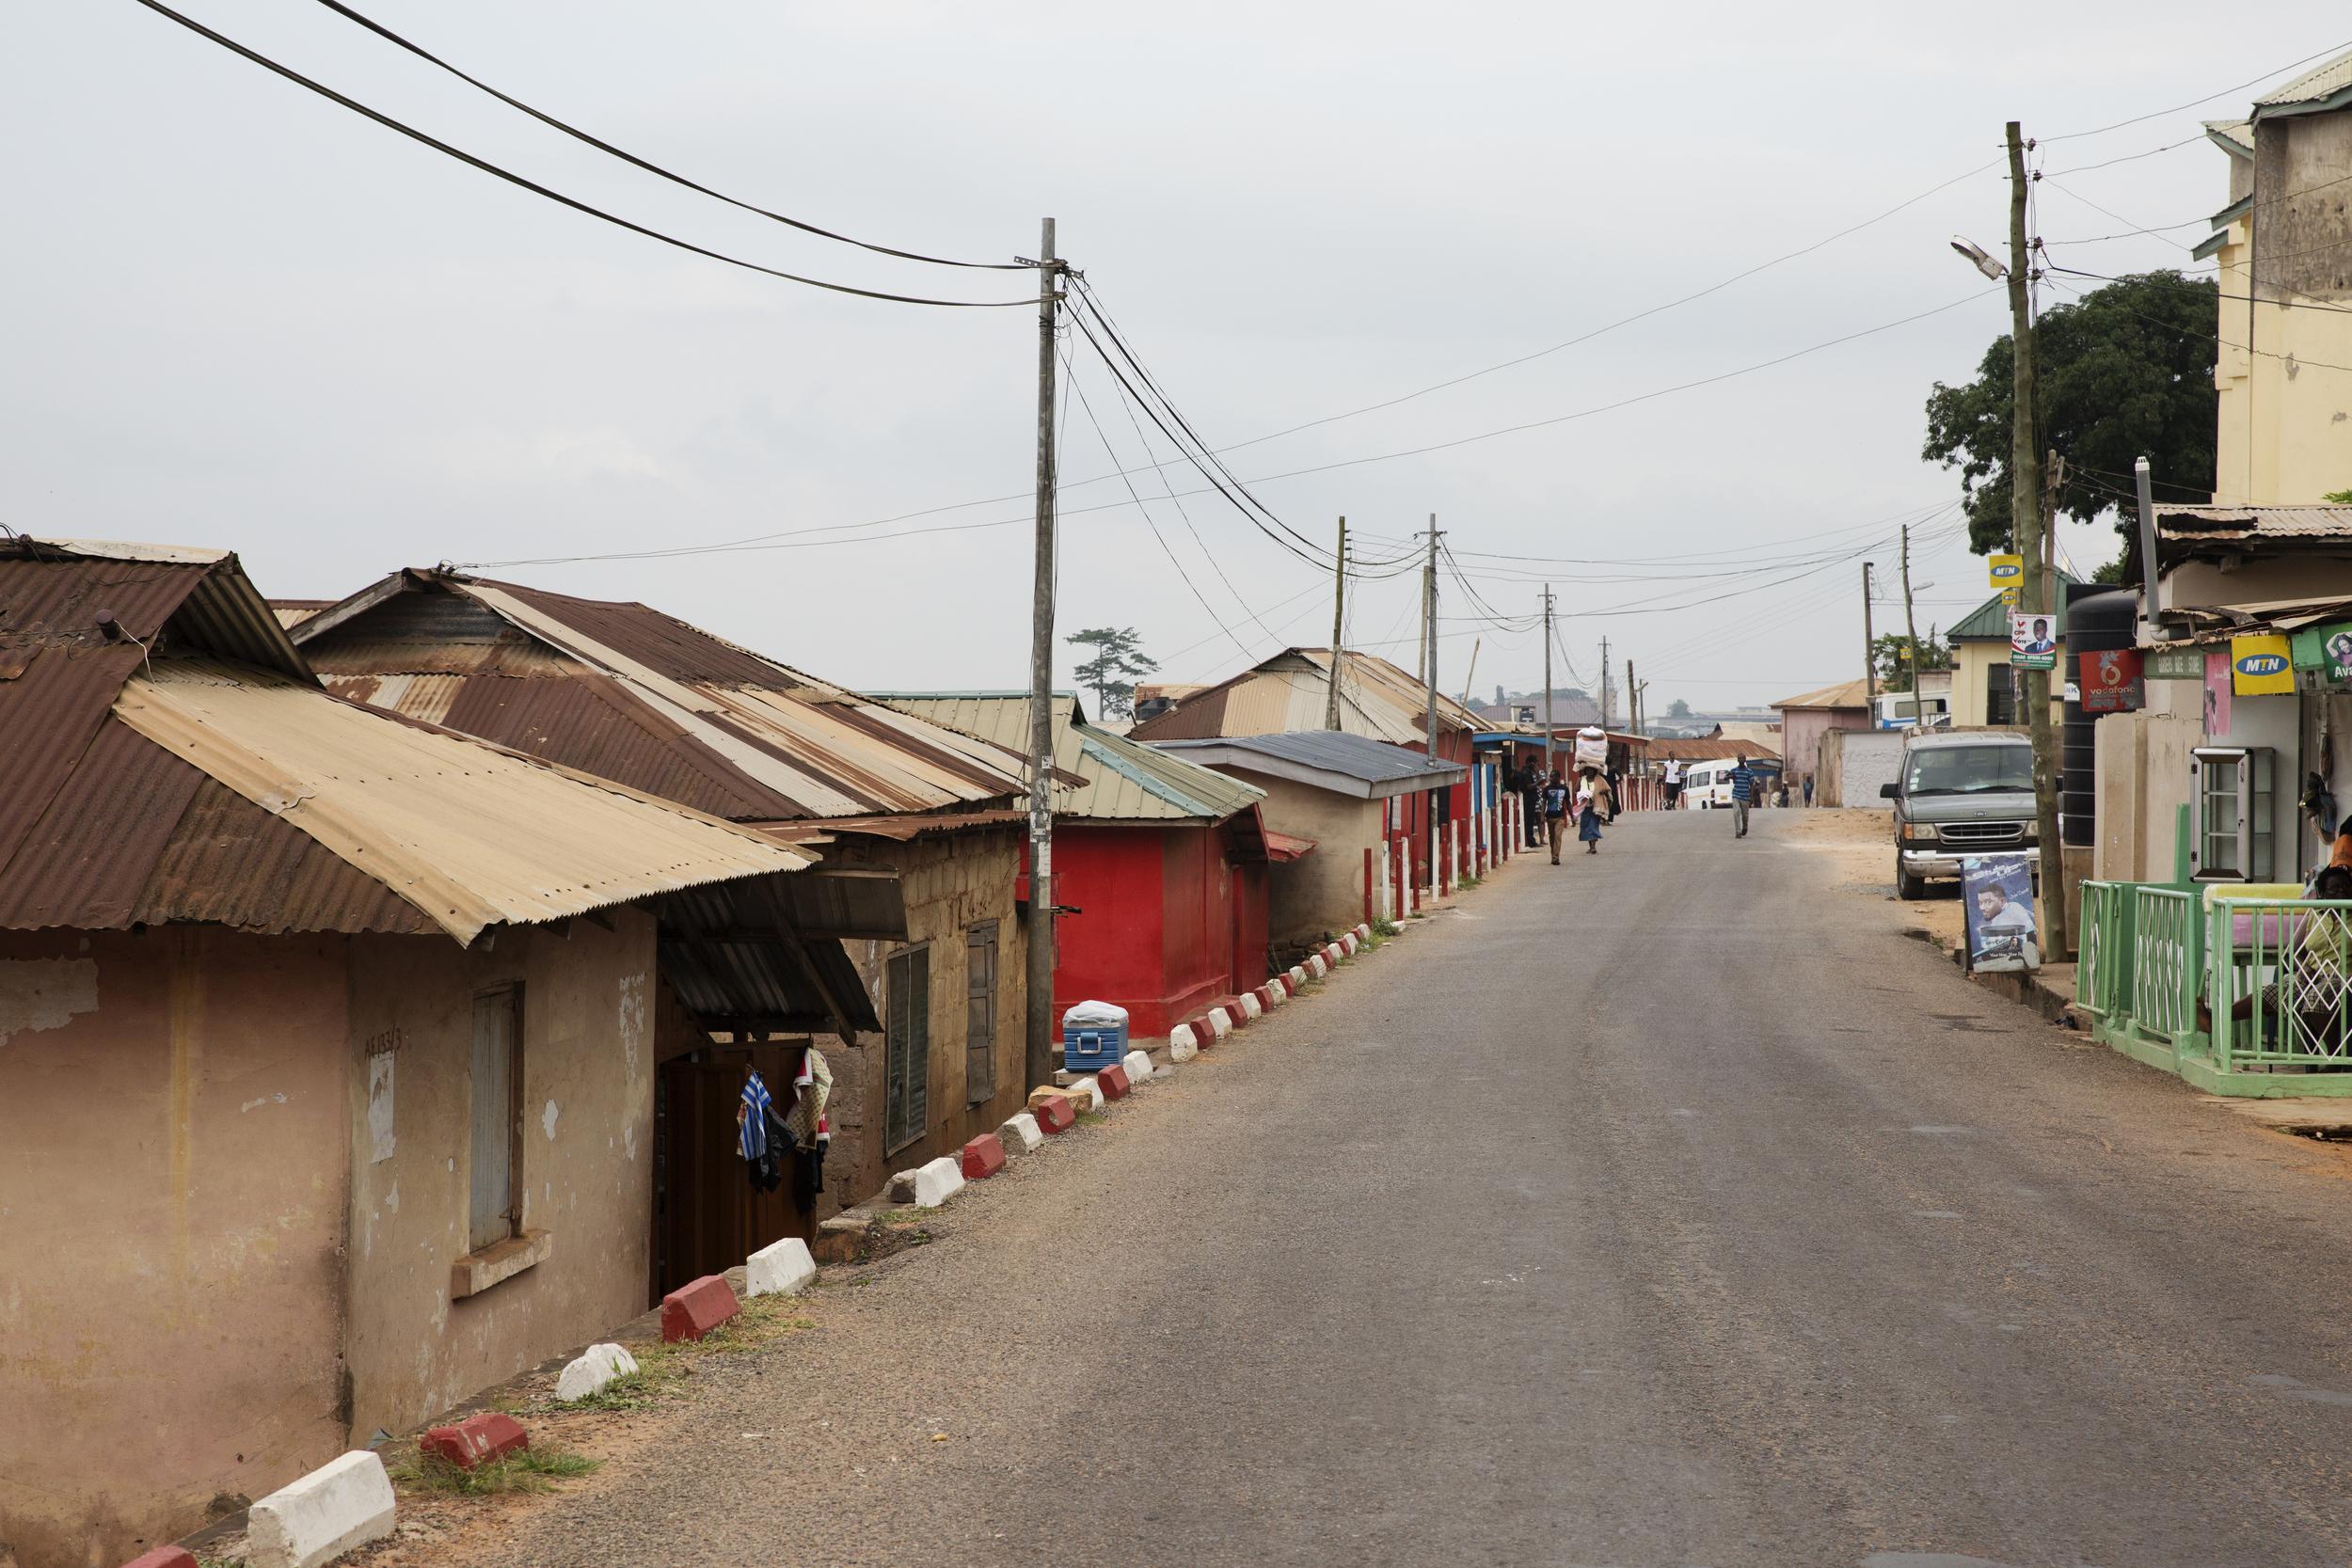 Here is the super cute town of Aburi (pronounced Ah-bree)!